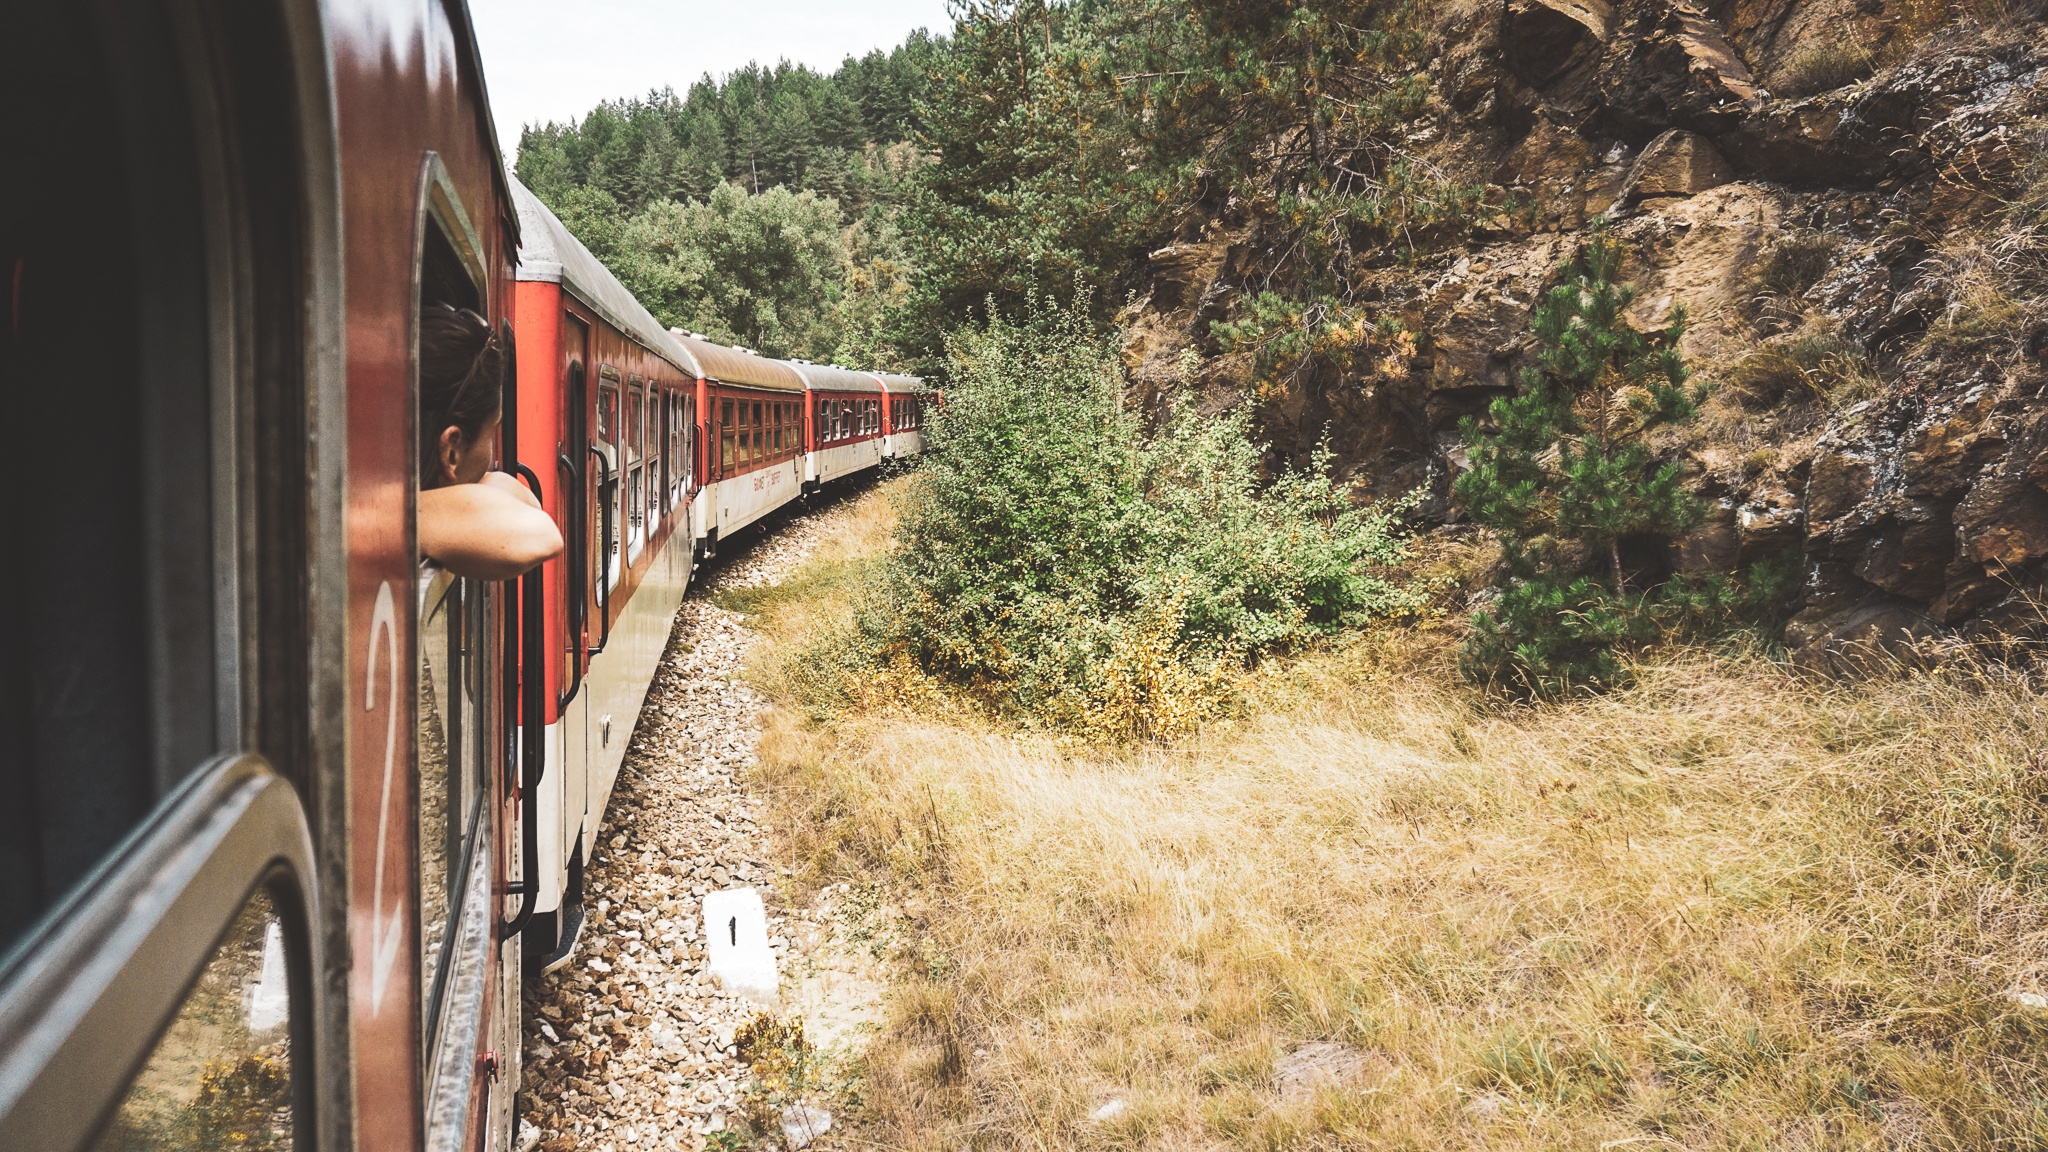 Rhodope Narrow Gauge Train, Bulgaria